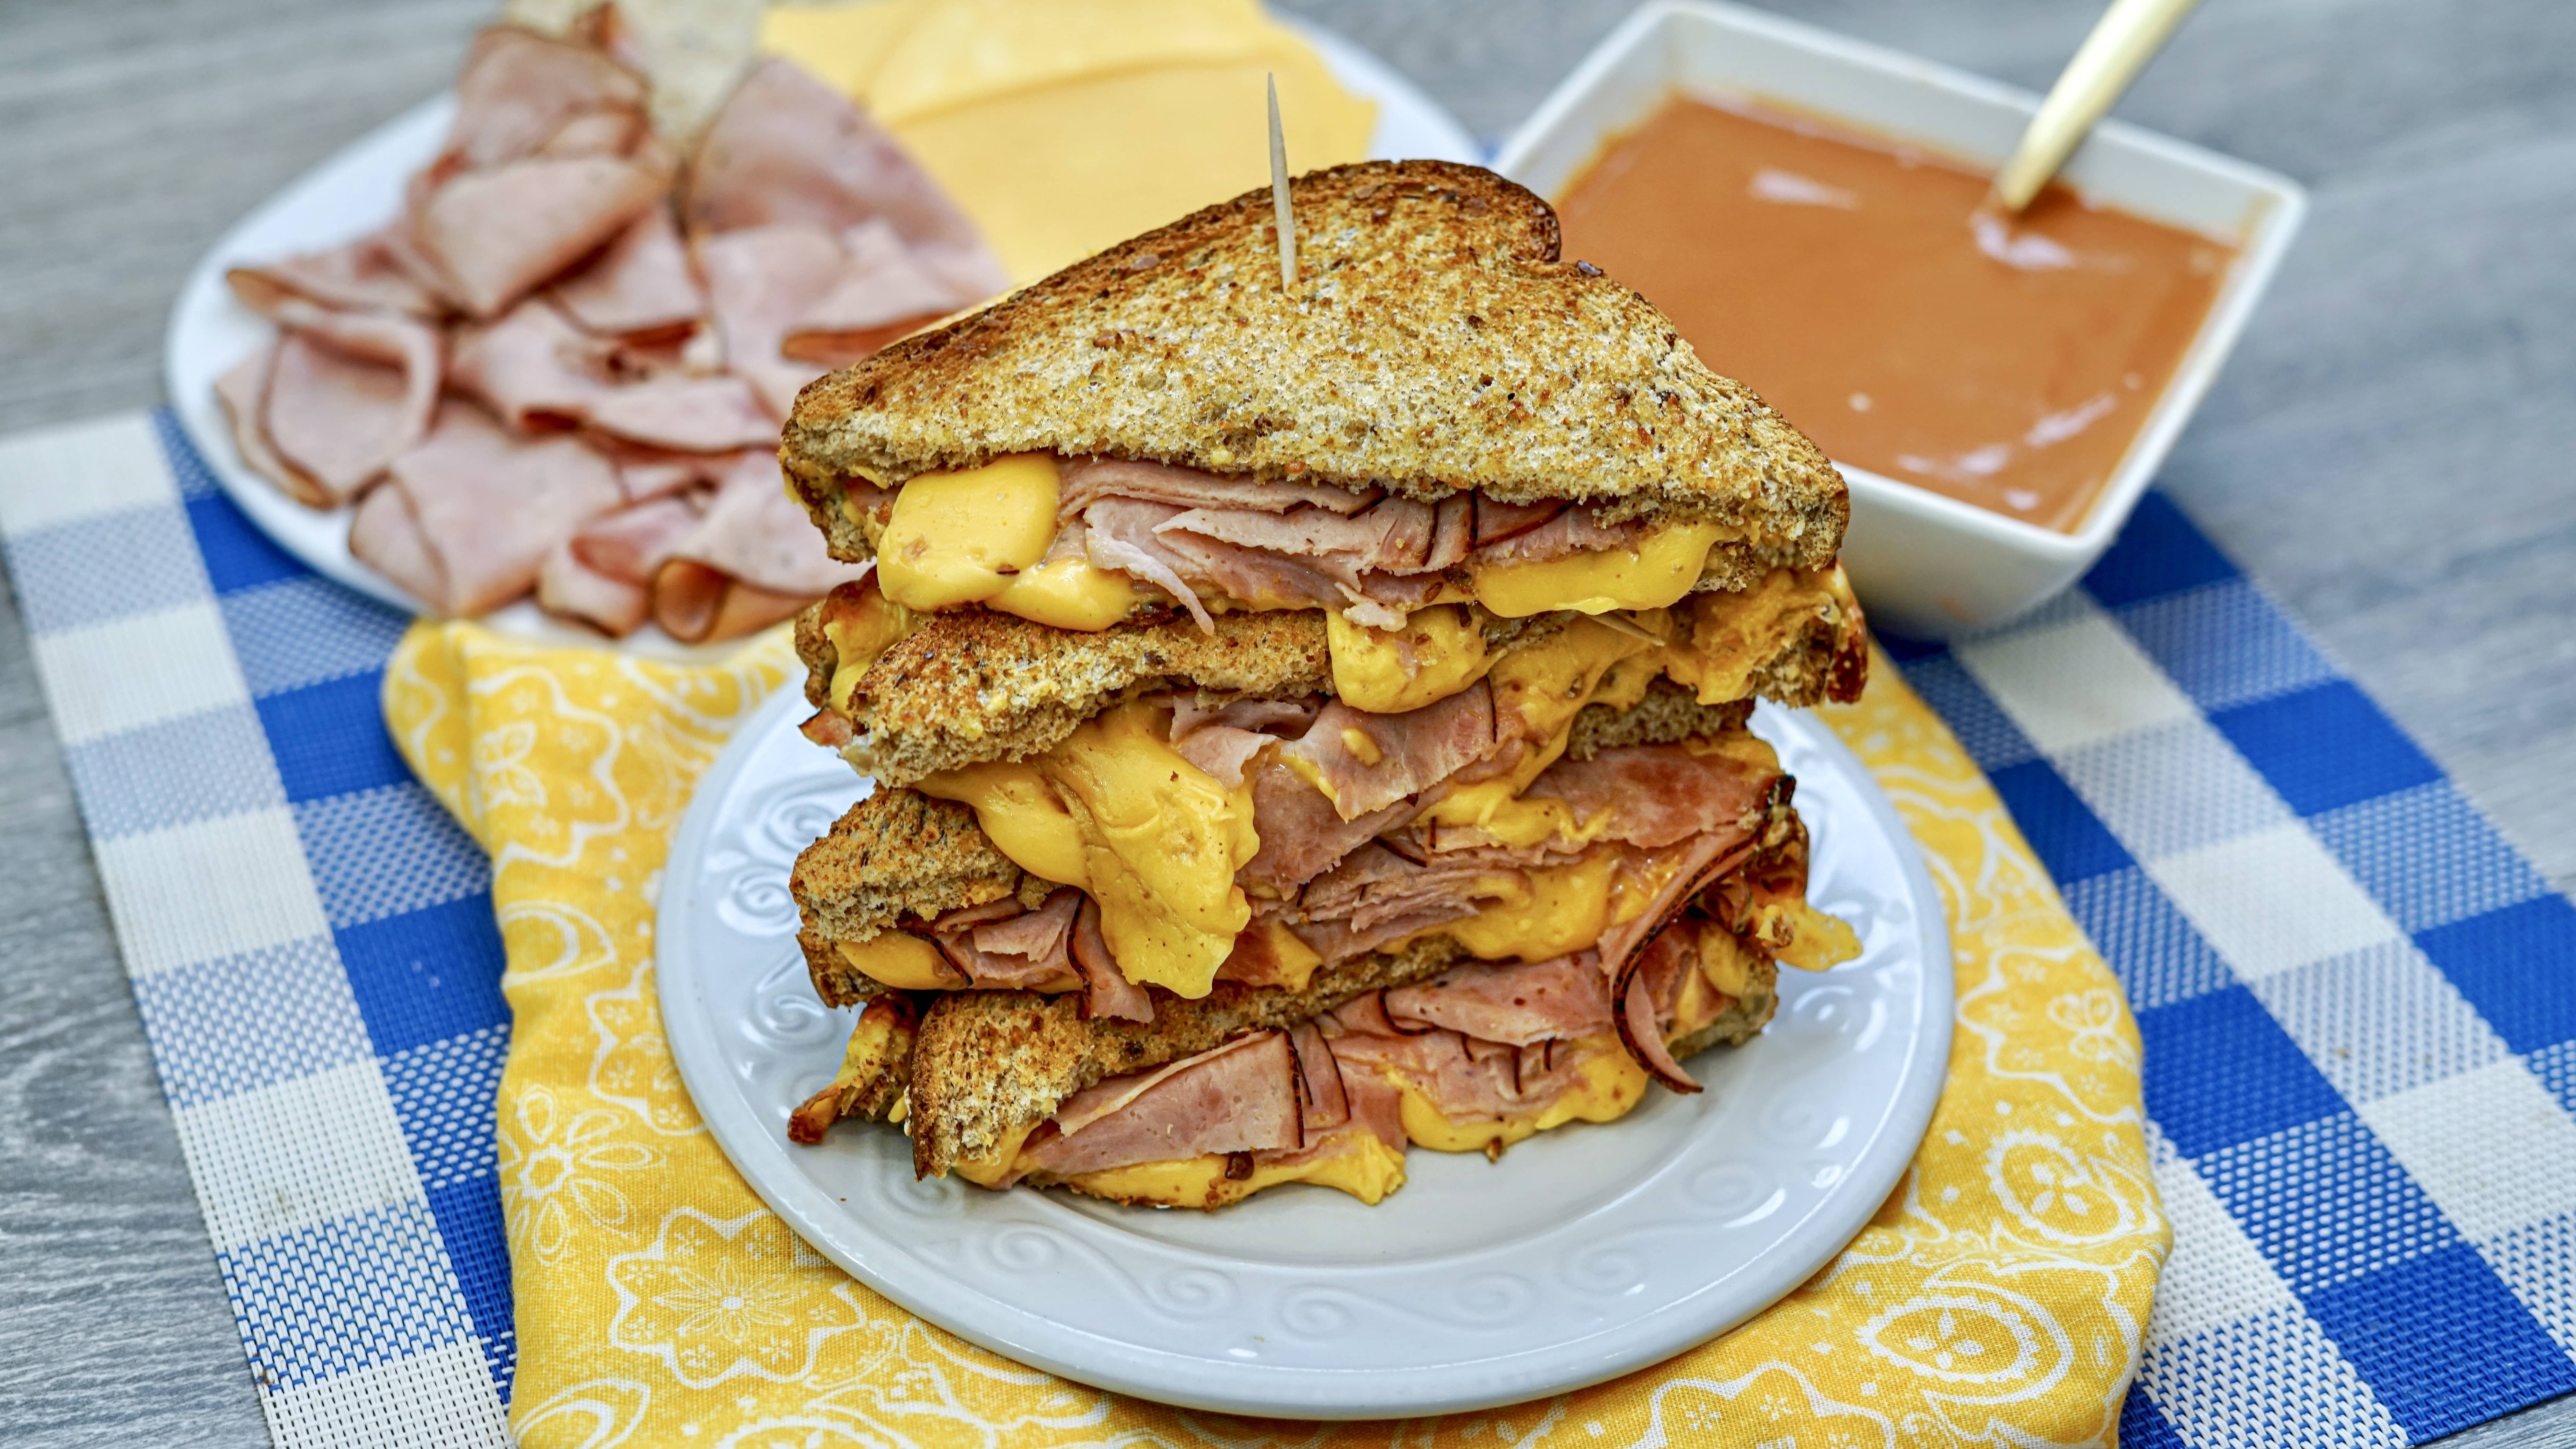 World's Best Air Fryer Grilled Ham and Cheese Sandwich Recipe